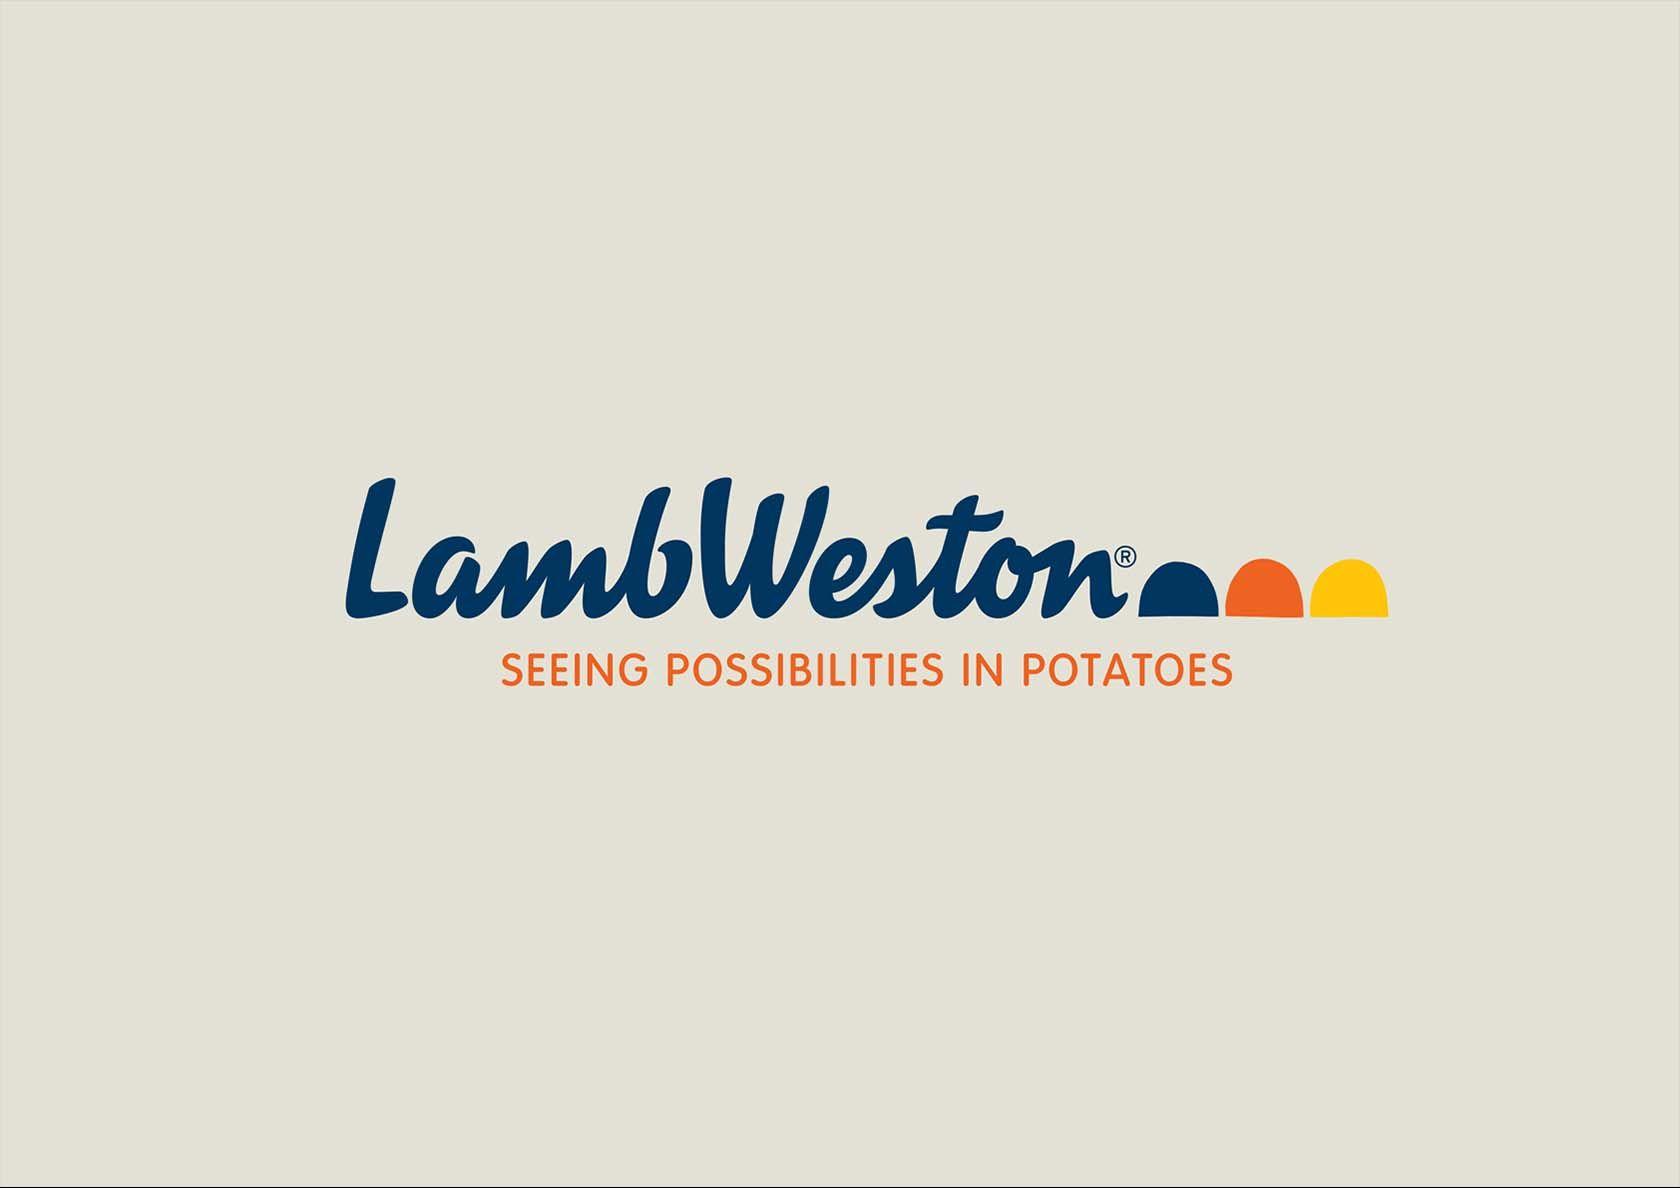 WMH-LAMB-WESTON-LOGO-WEB image